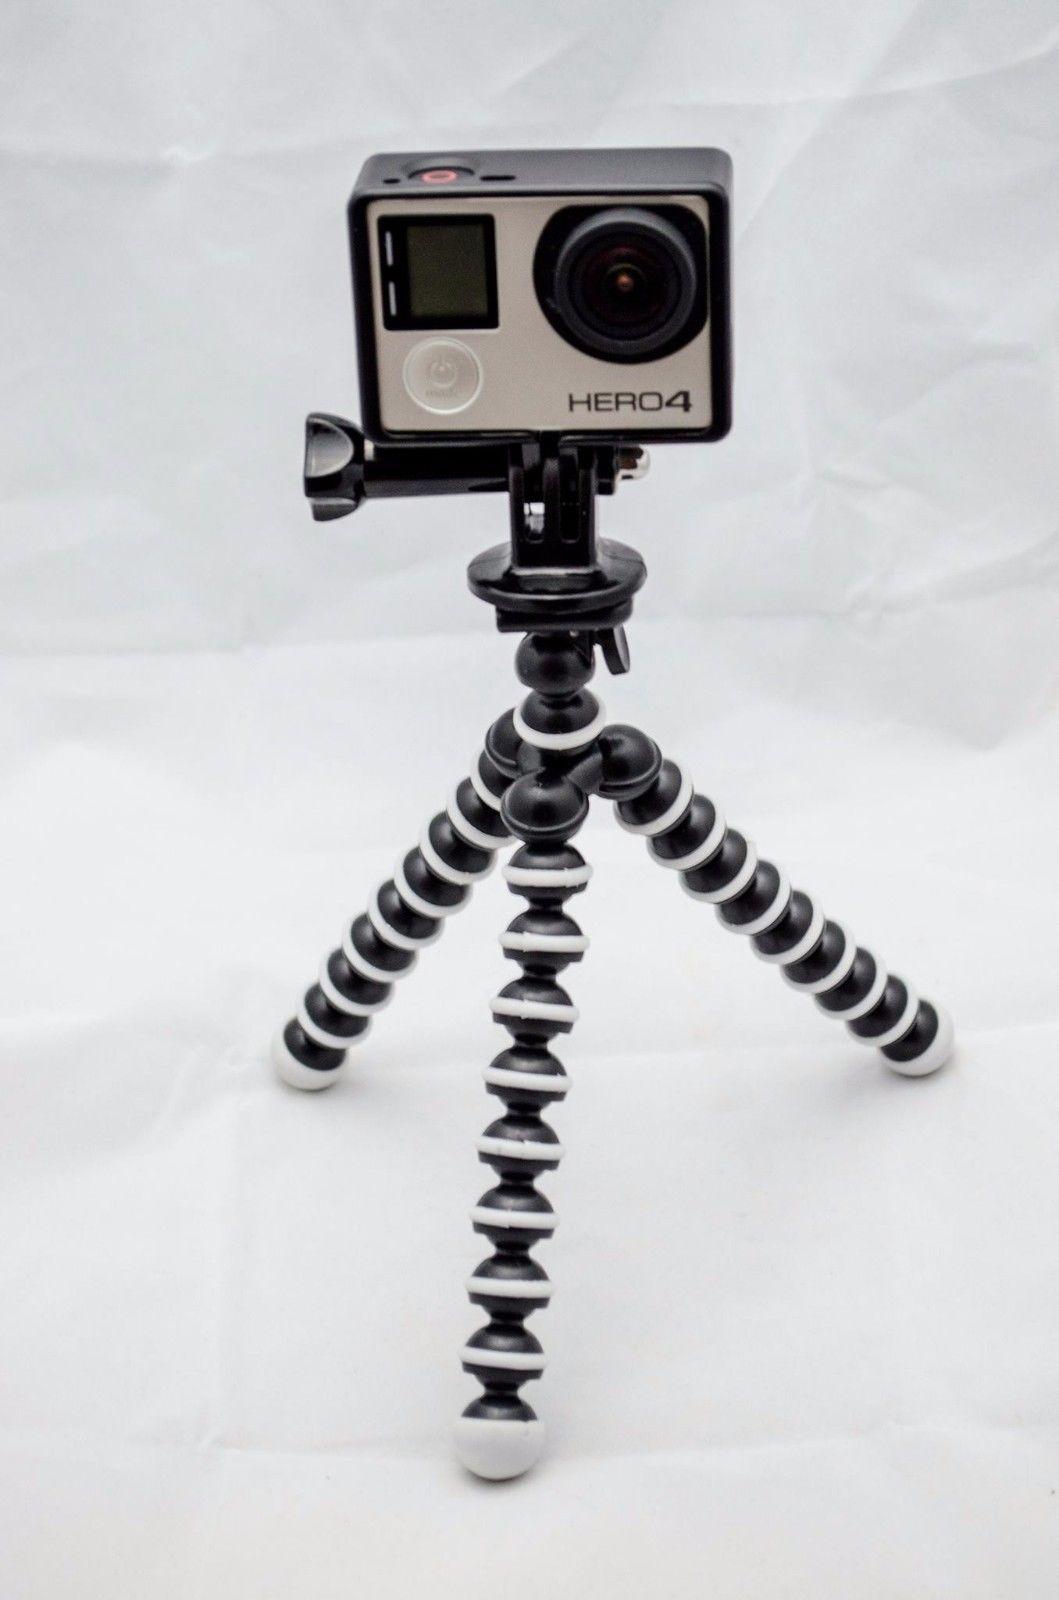 Tripod Set for GoPro Hero 4 (Mini Tripod, Mount, Housing & Screw) + FREE Nice britain POST